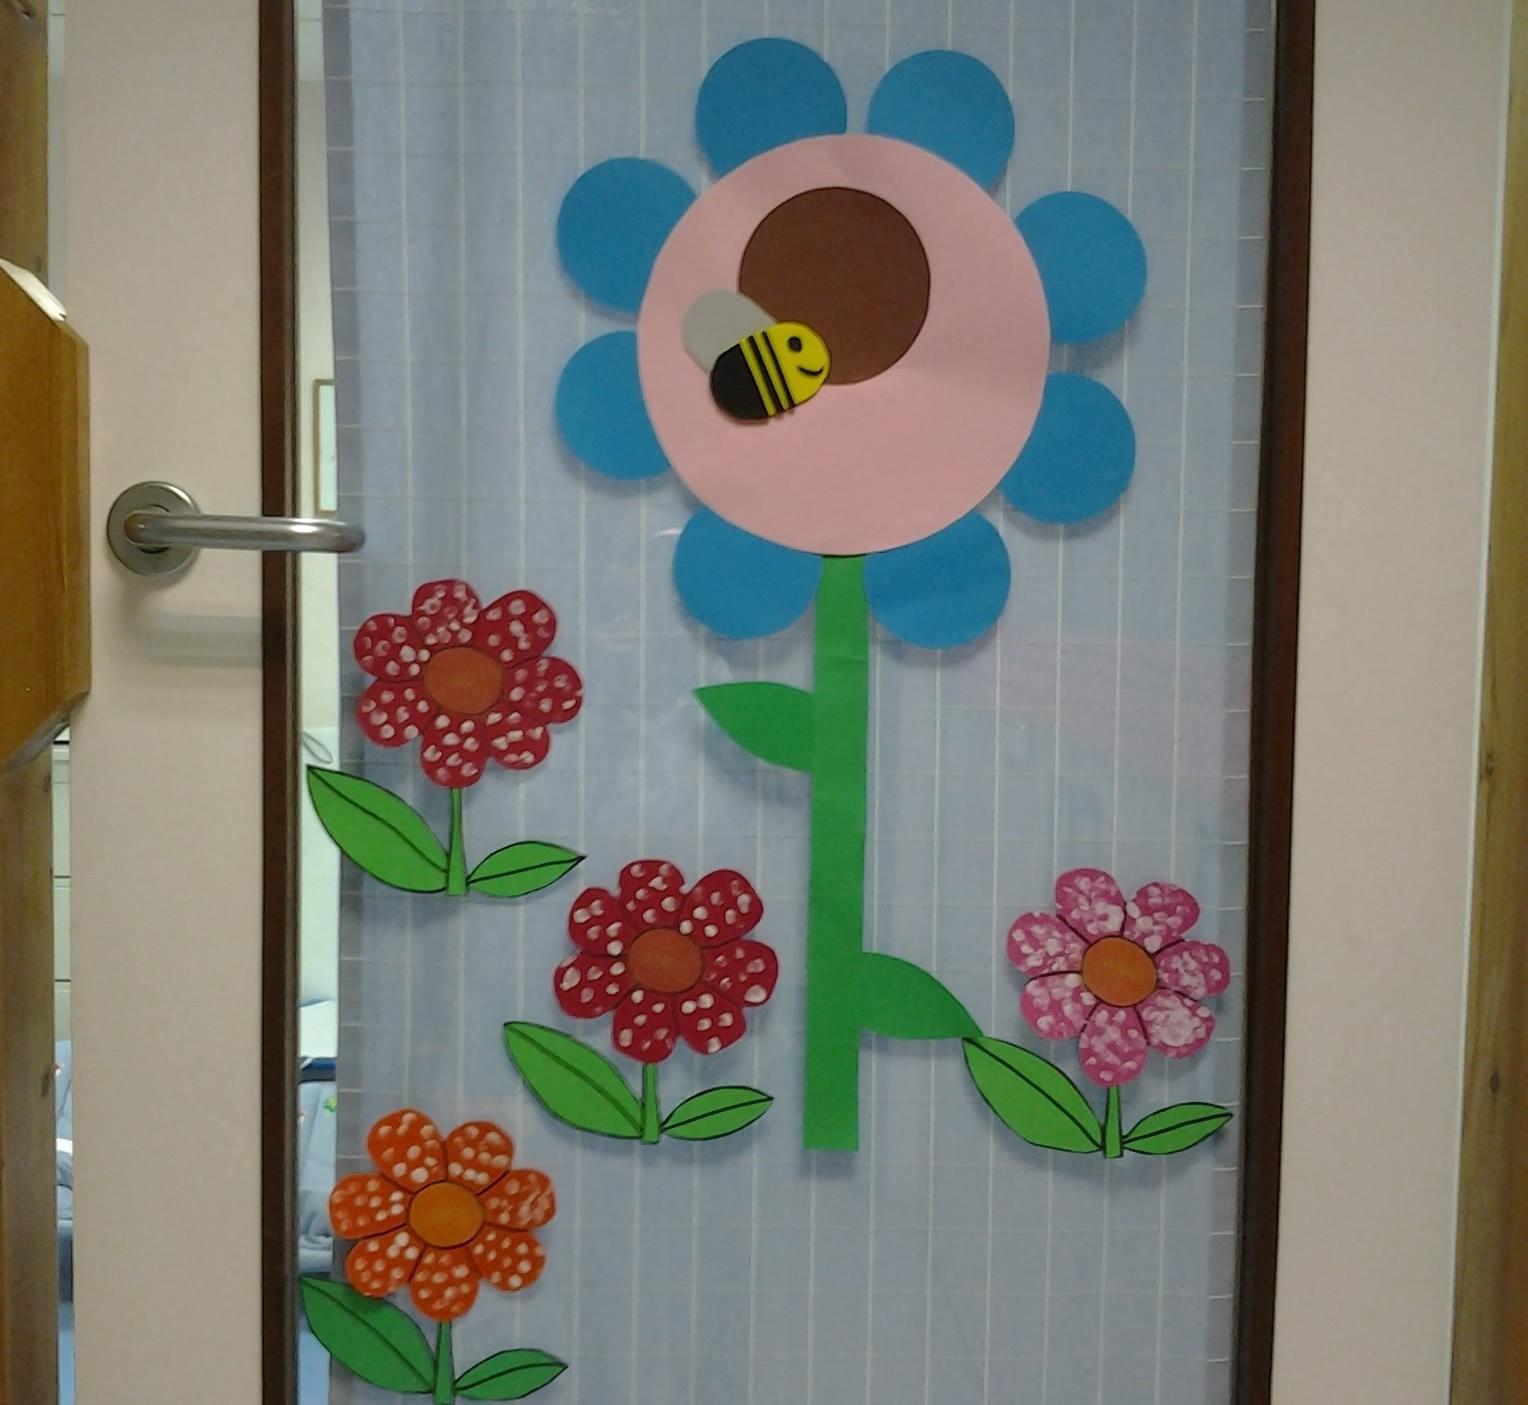 Primavera puertas 23 imagenes educativas for Decoracion puerta aula infantil